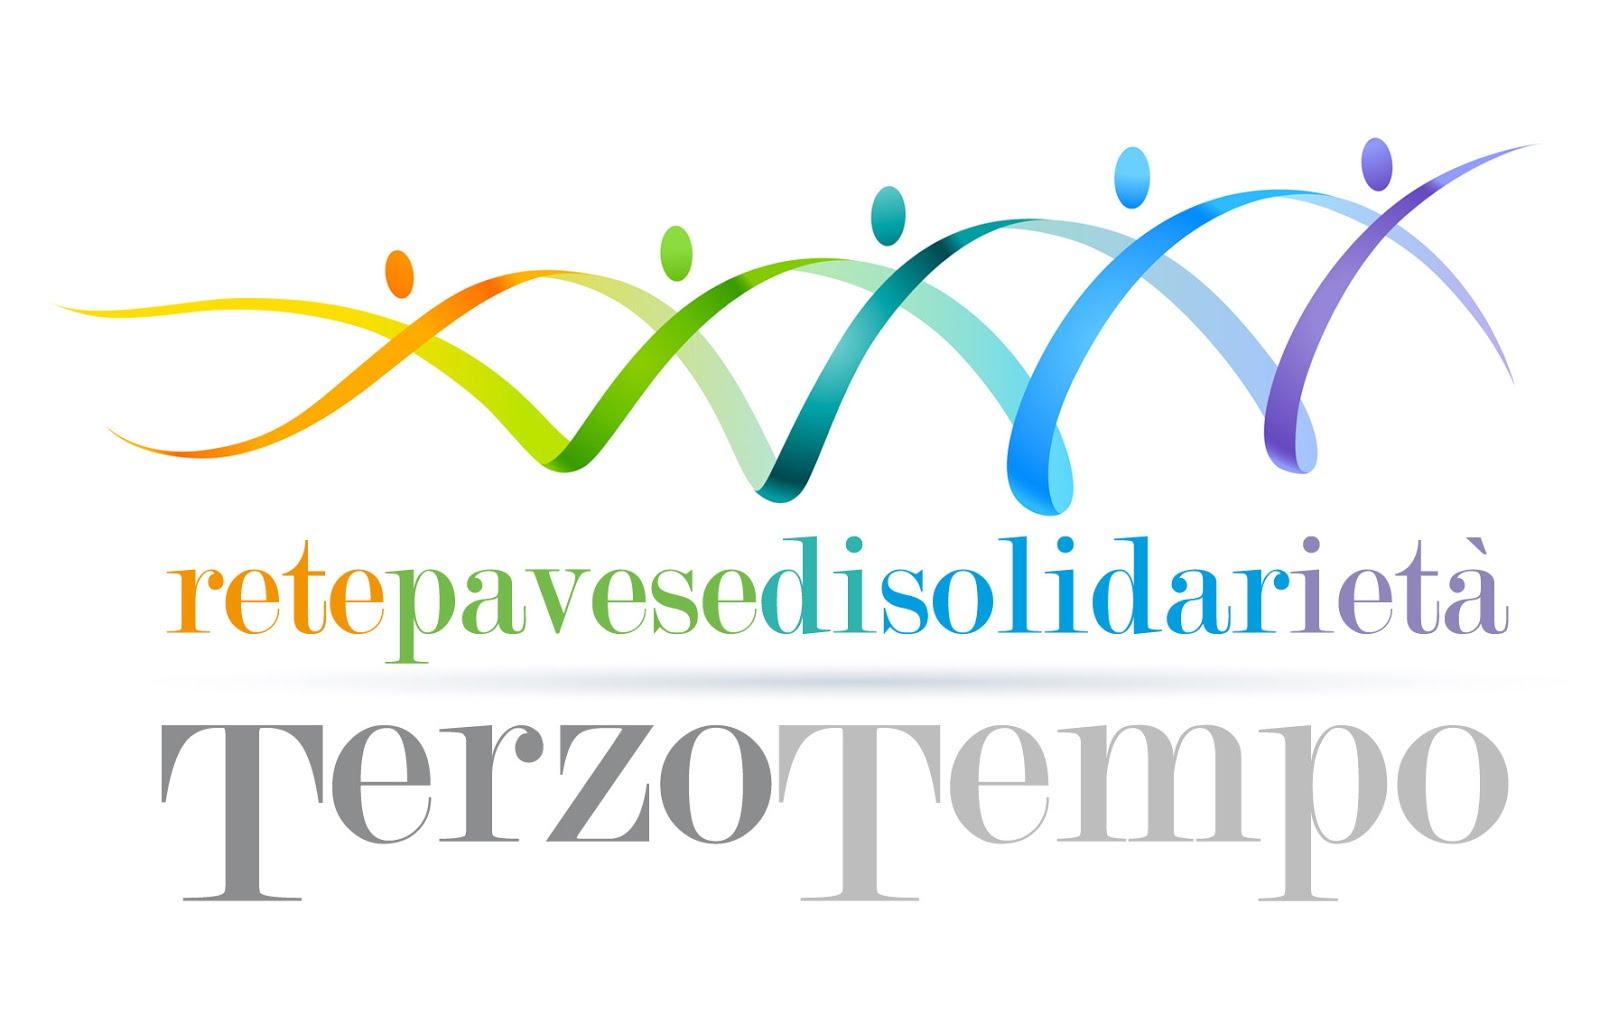 Terzo Tempo Pavia